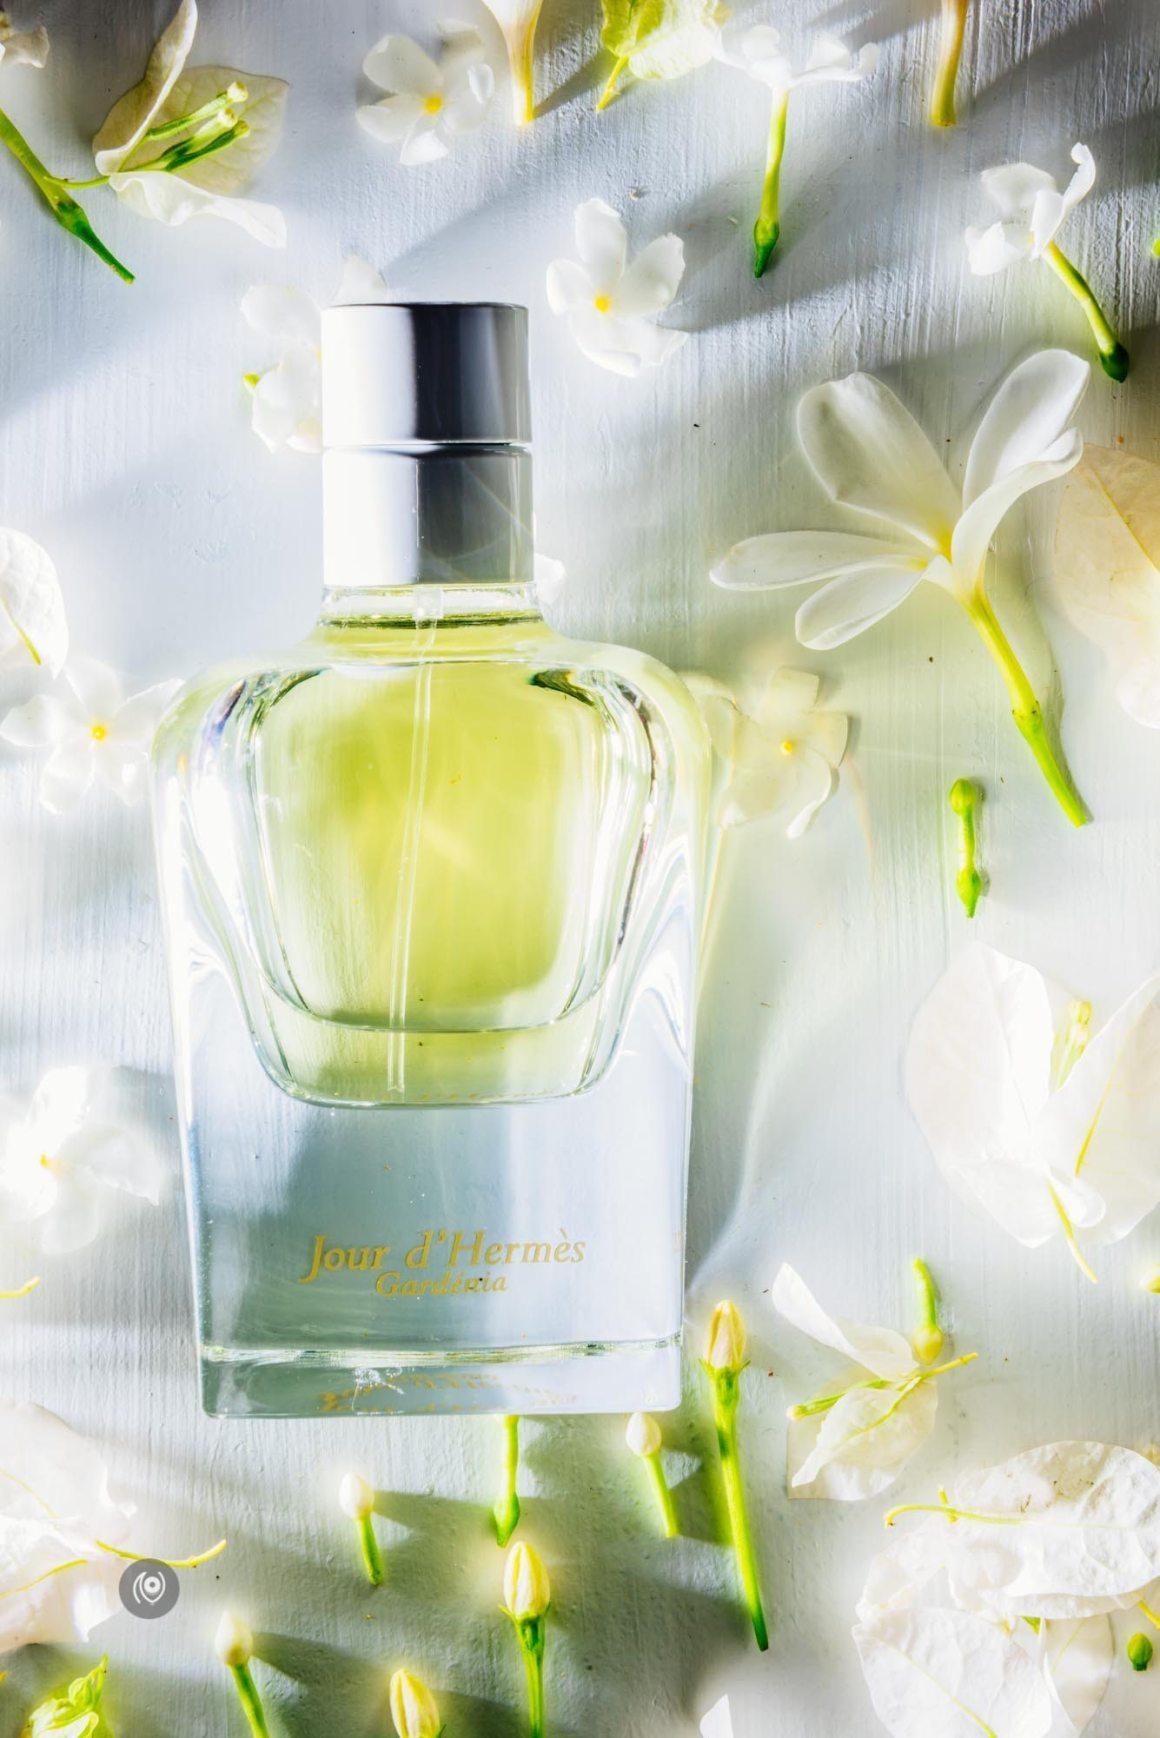 FragranceOfTheMonth-Naina.co-Jour-Hermes-Gardenia-EyesForLuxury-12